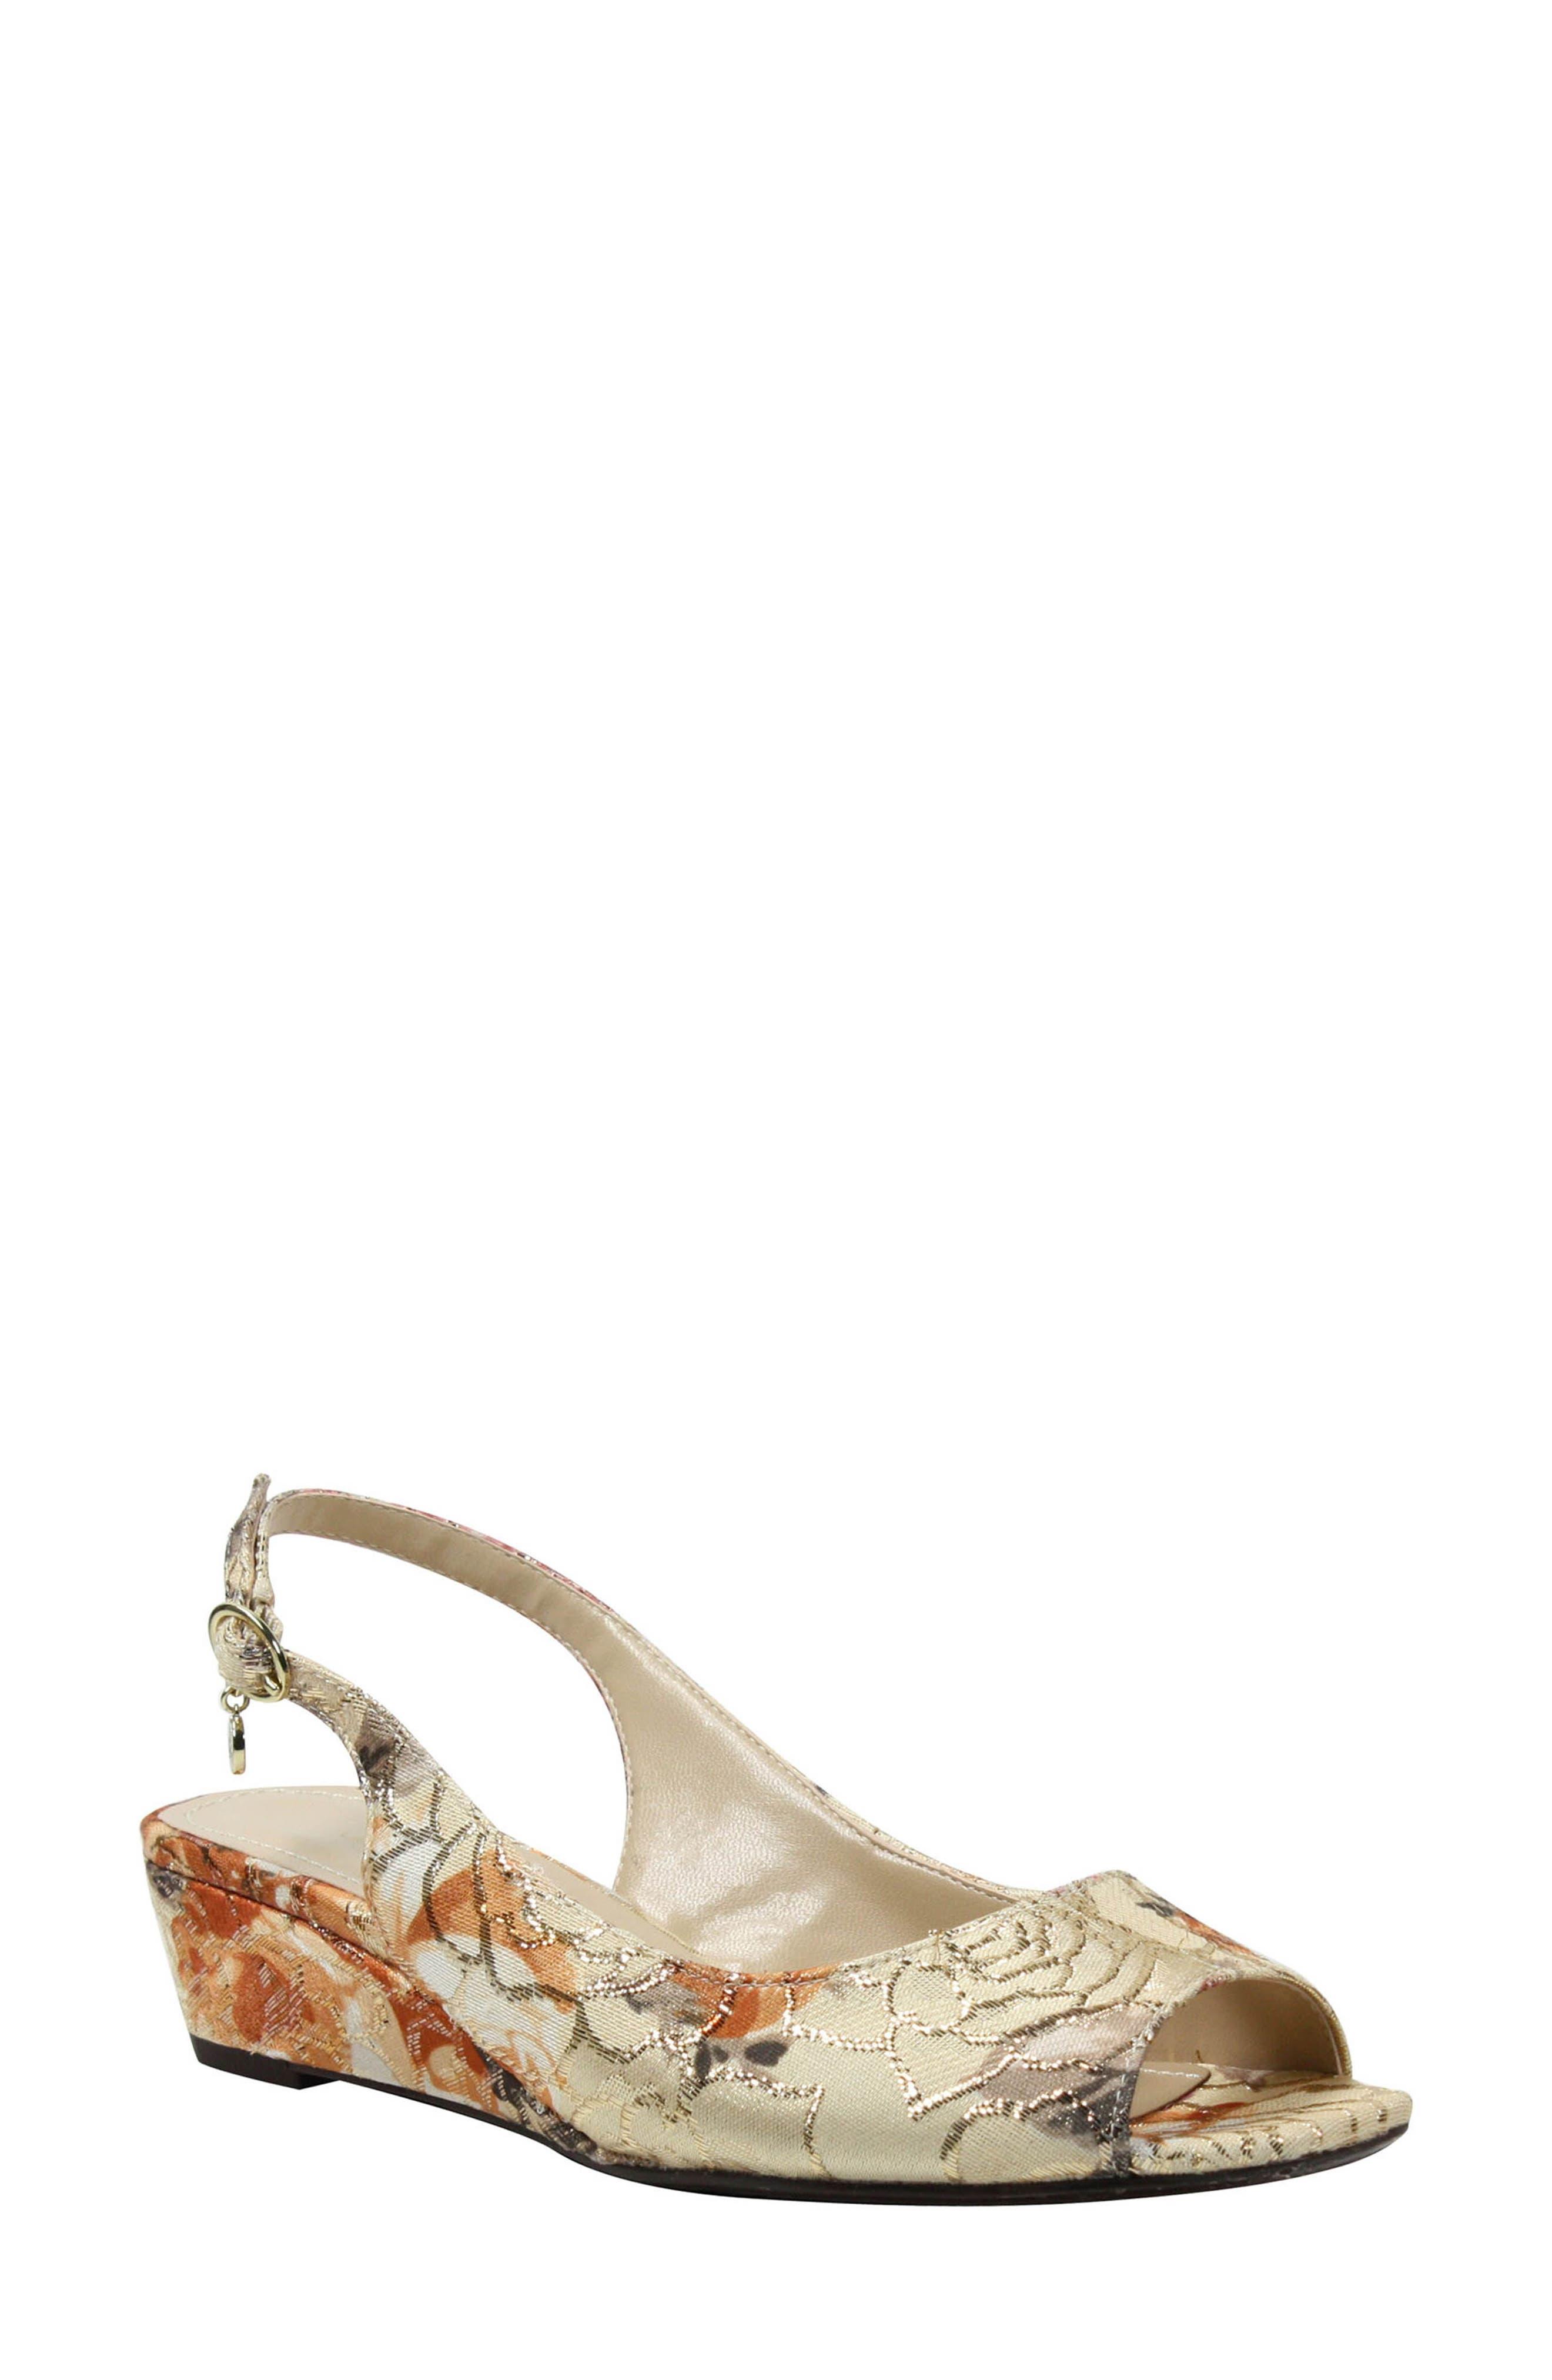 Alivia Slingback Sandal,                             Main thumbnail 1, color,                             Nude Multi/ Gold Fabric